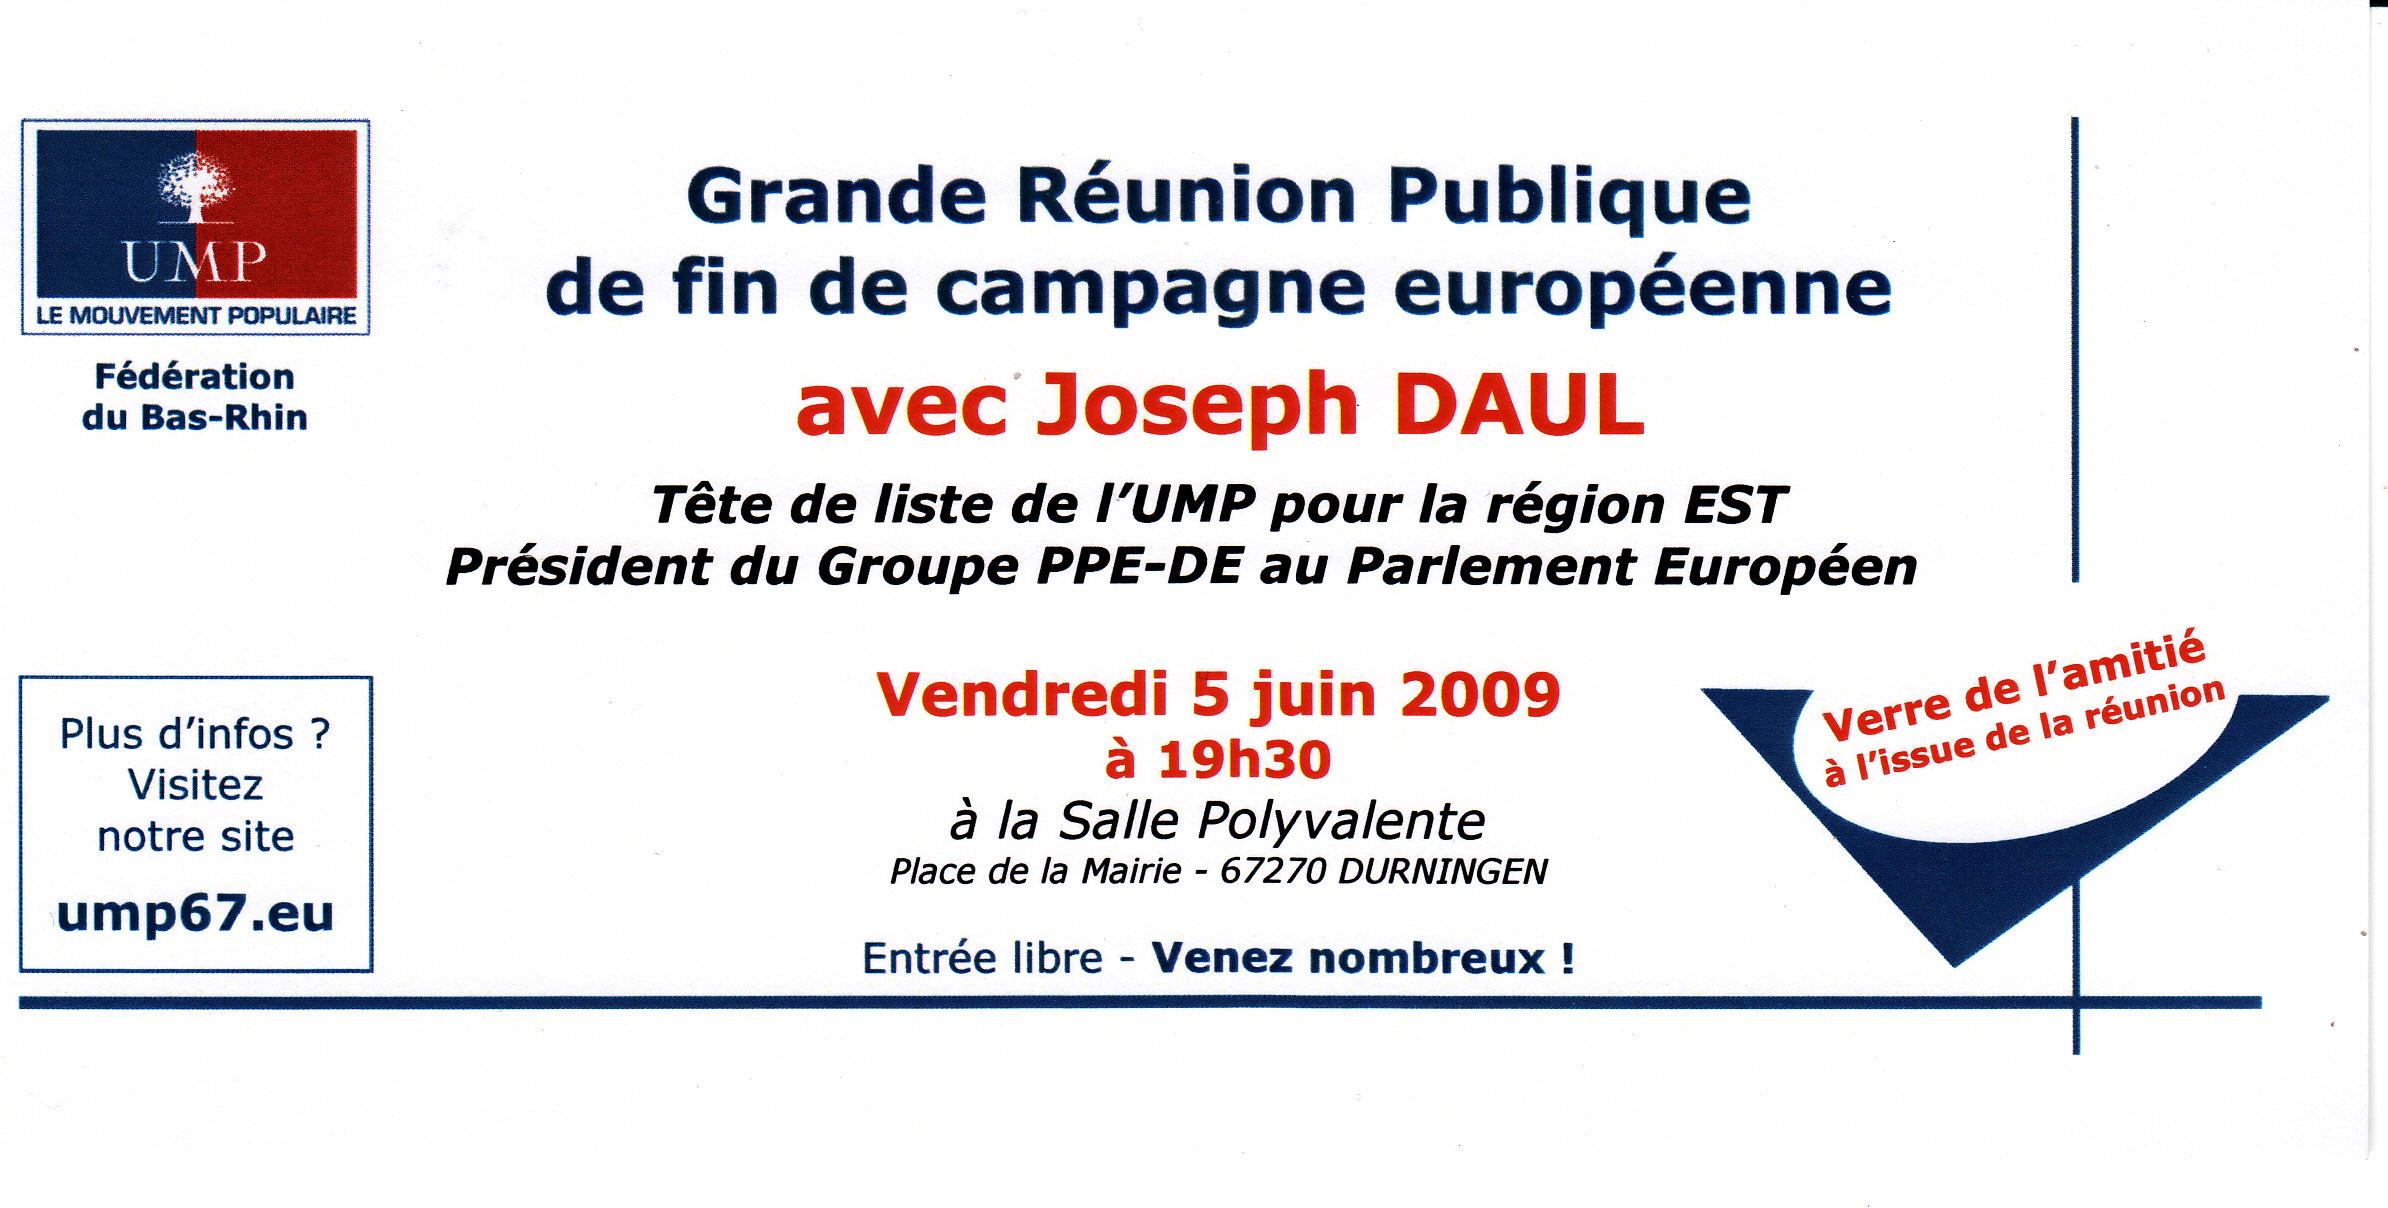 invitation daul rp 05-06-09